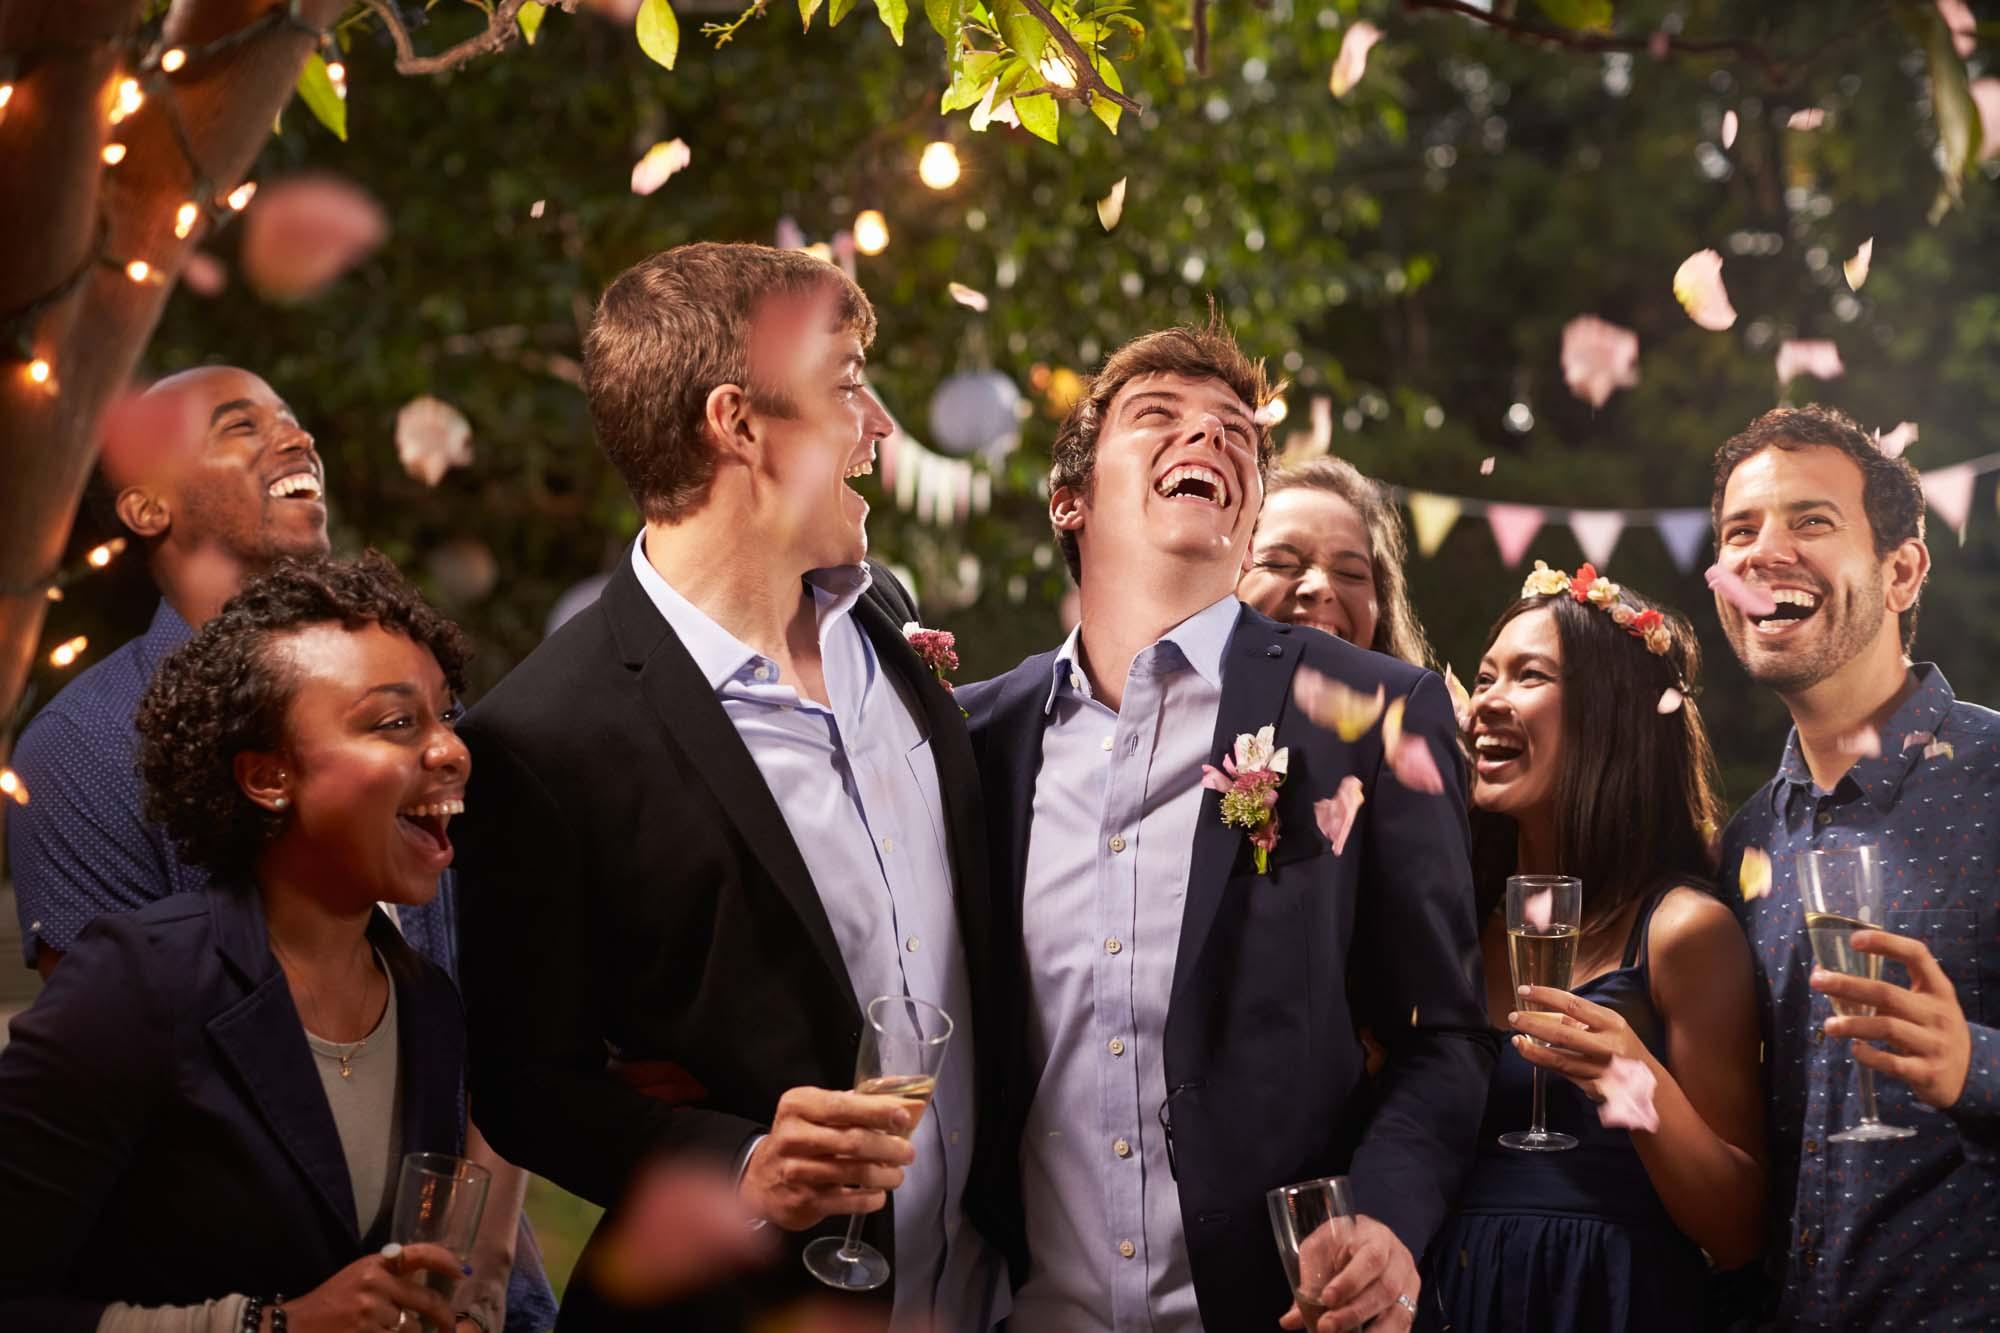 matrimonio gay vercelli unioni civili same sex